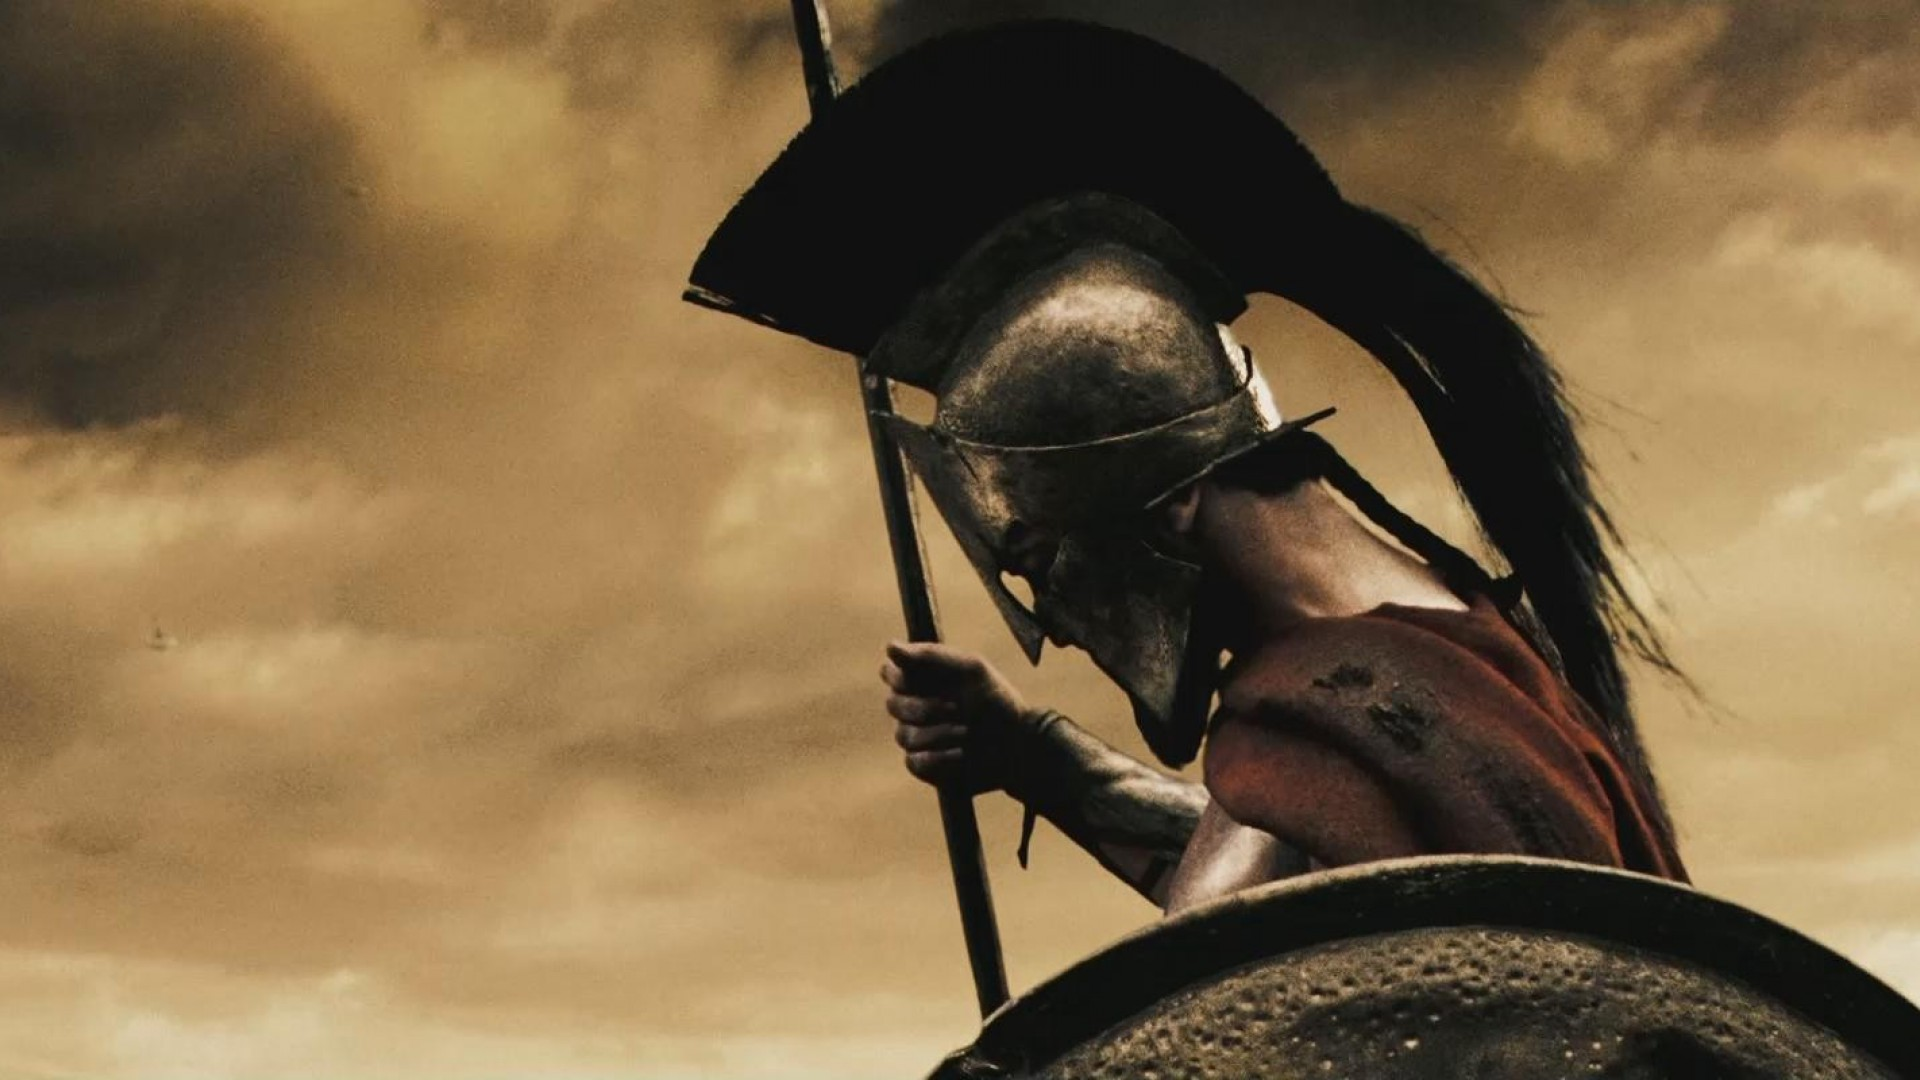 spartan krypteia a form of ancient guerrilla warfare